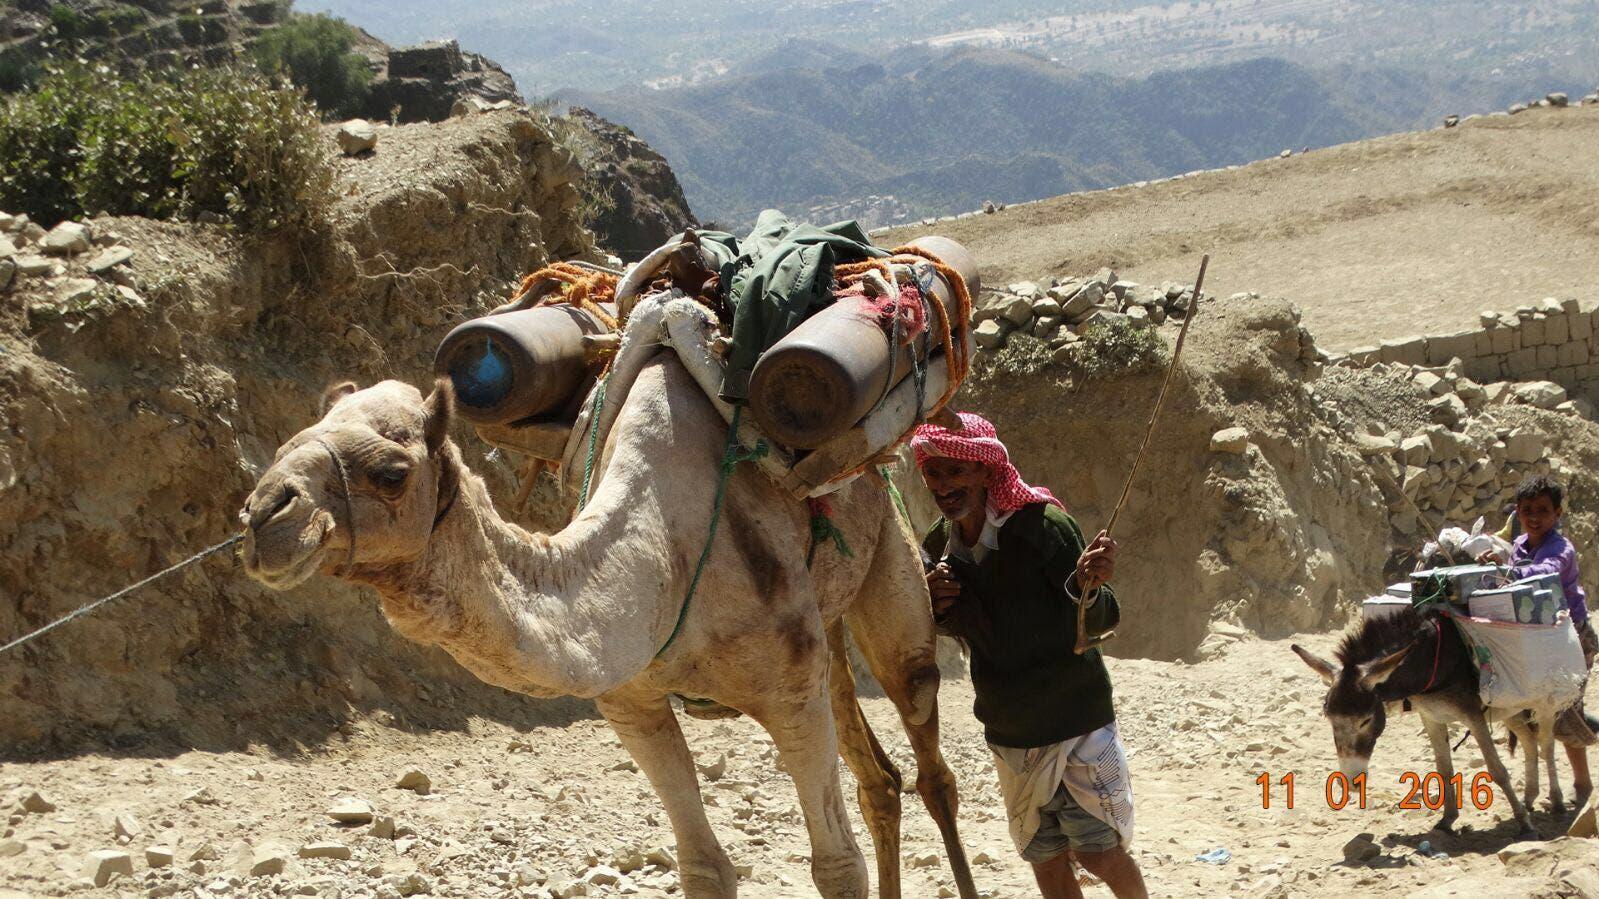 Smuggling supplies into Taez (Photo courtesy: Essam al-Batraa)